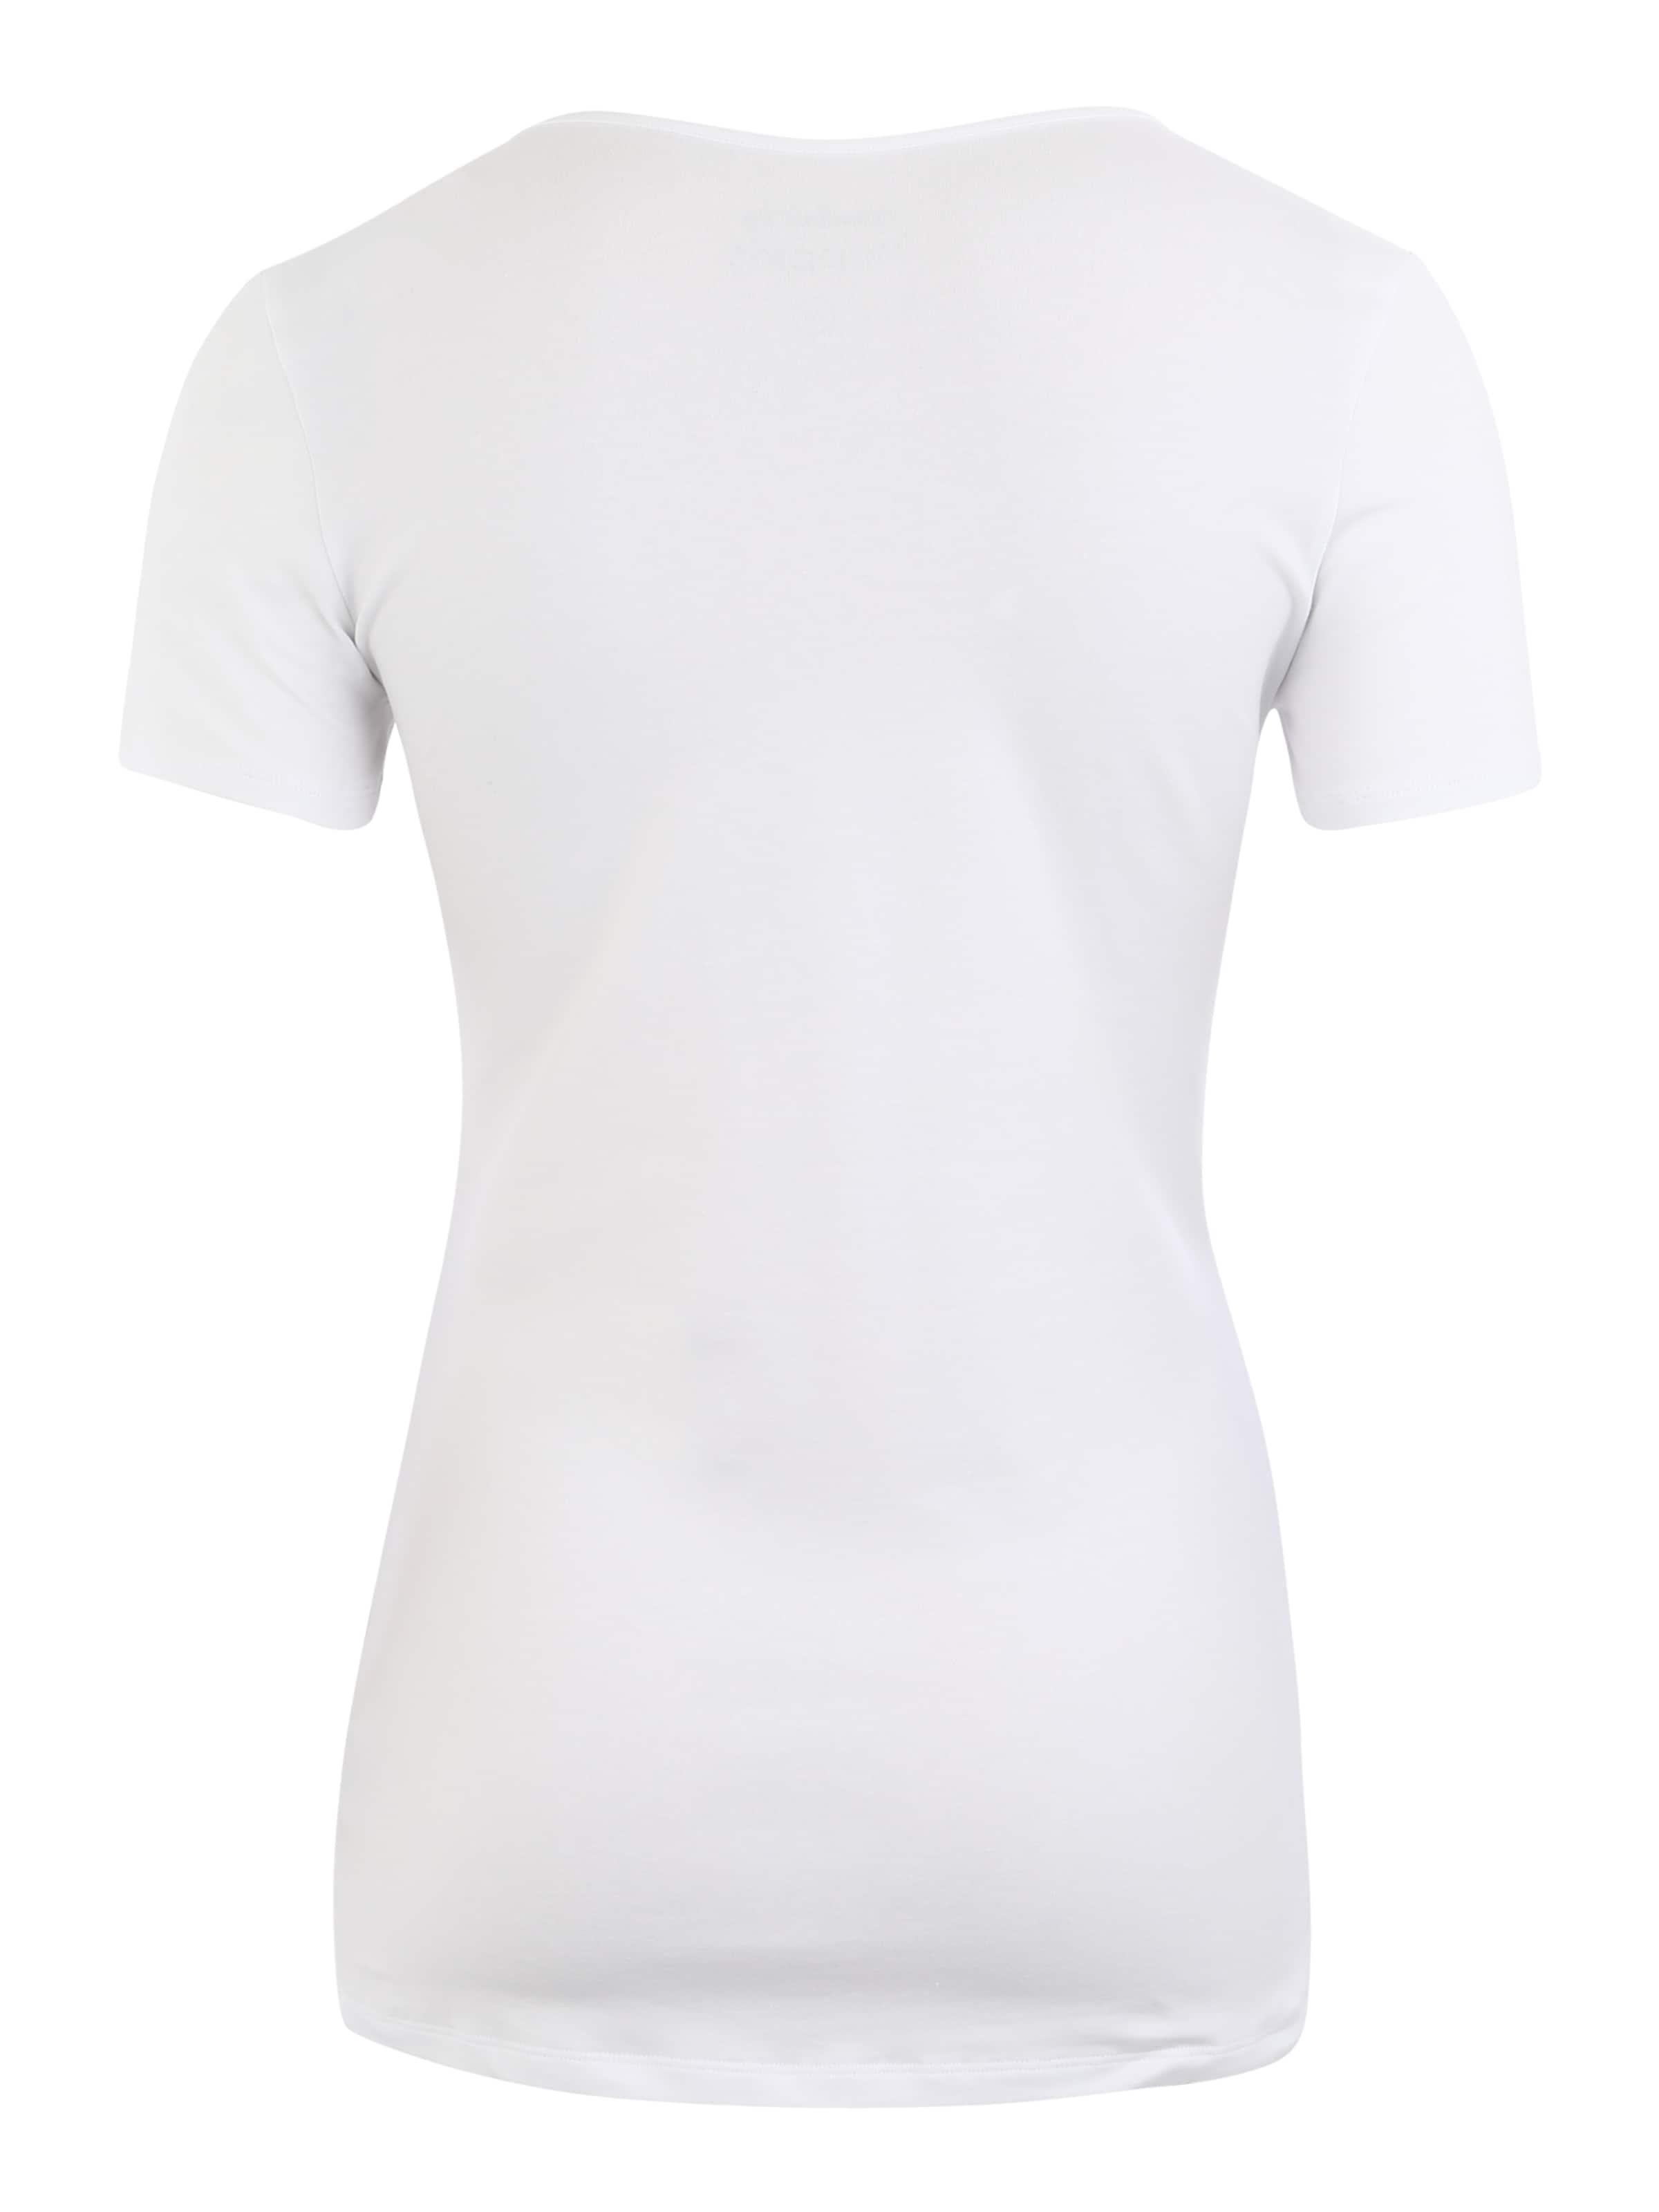 Weiß T Noppies In shirt 'berlin' n8myNwv0O